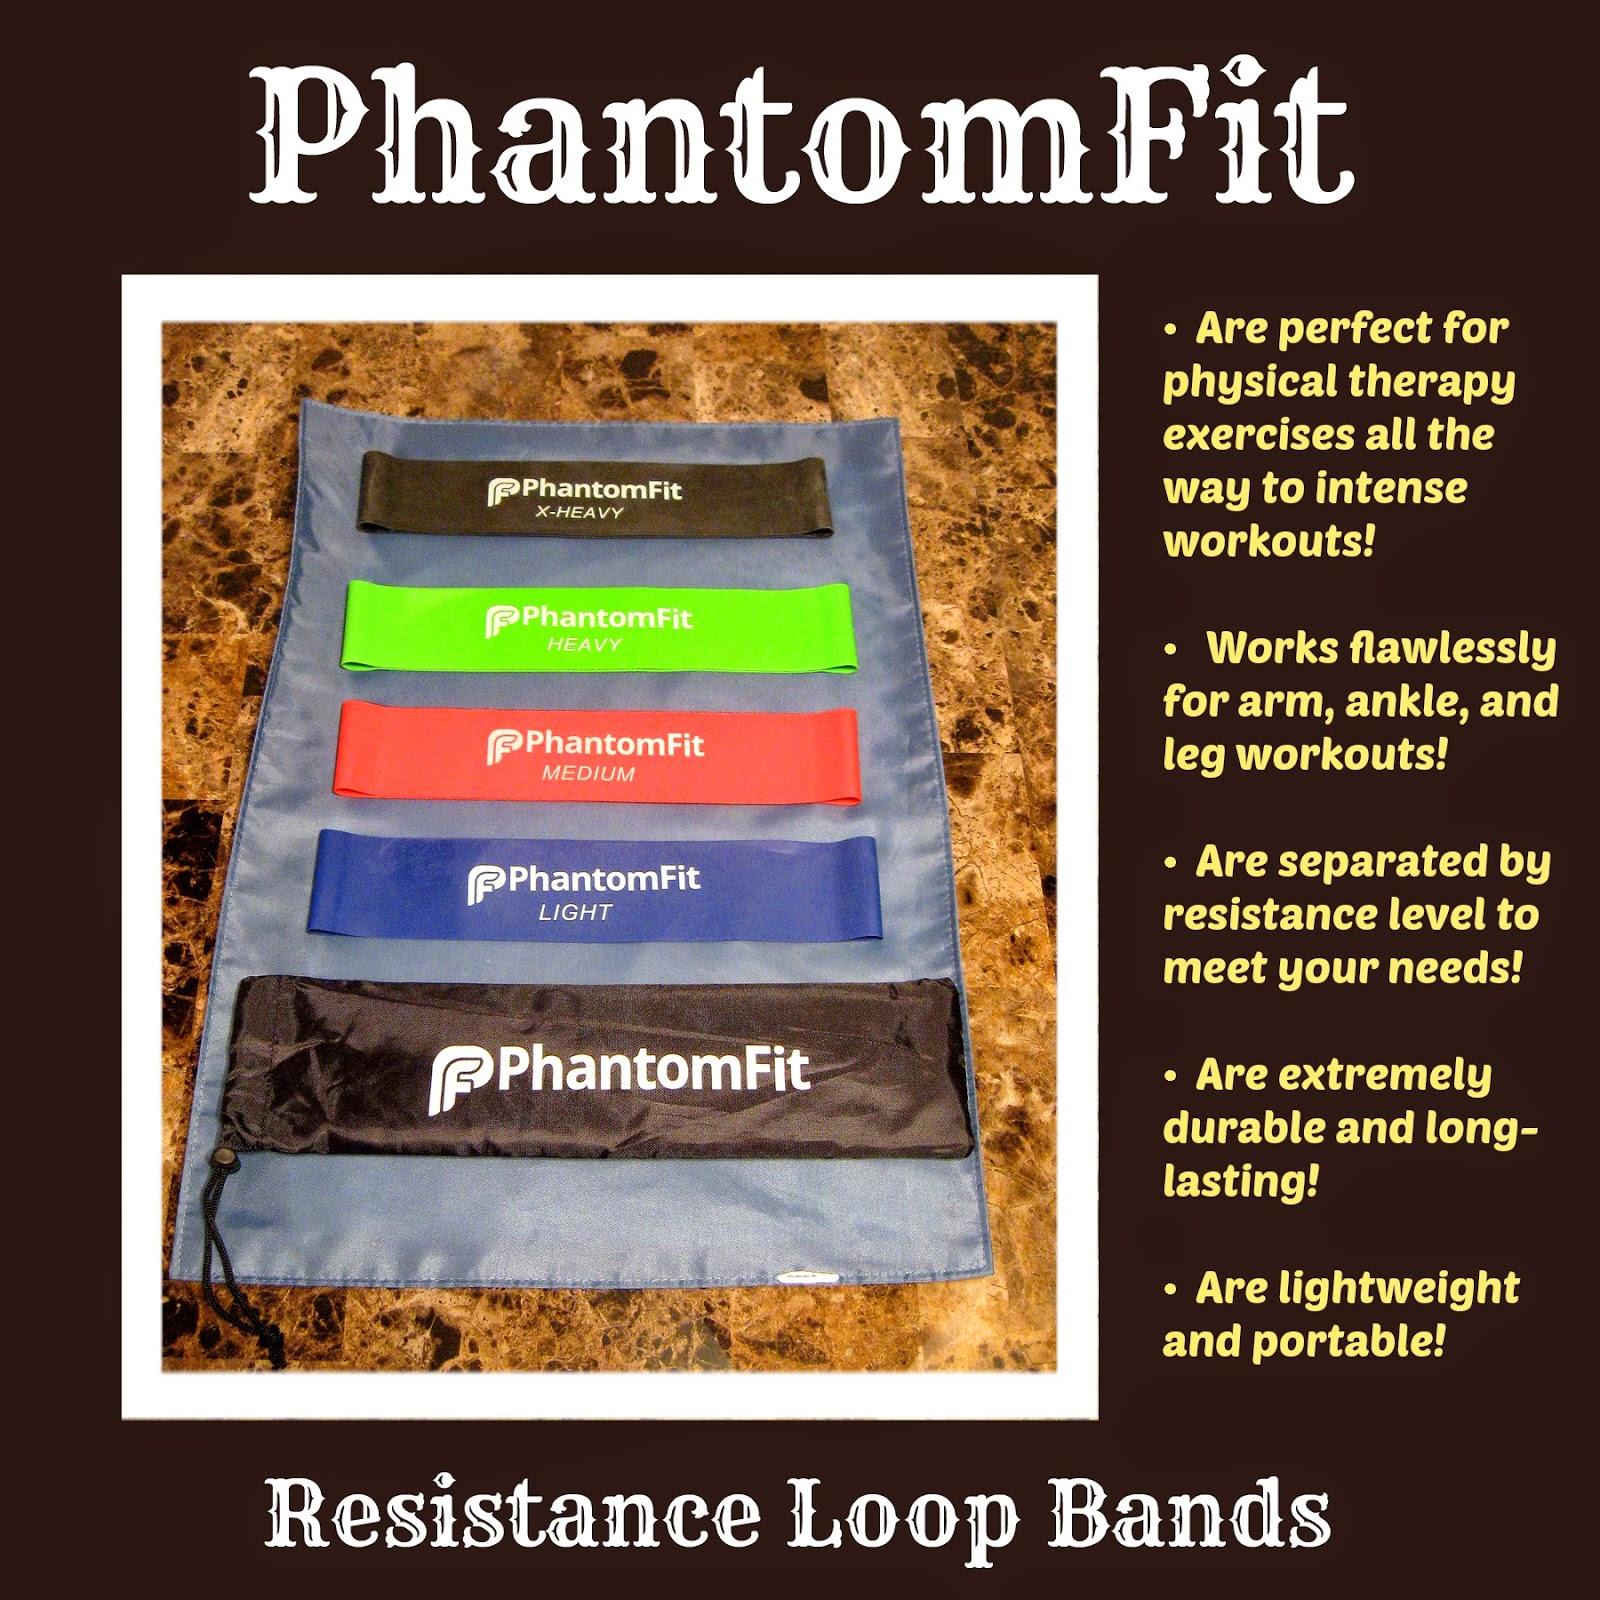 #PhantomFit